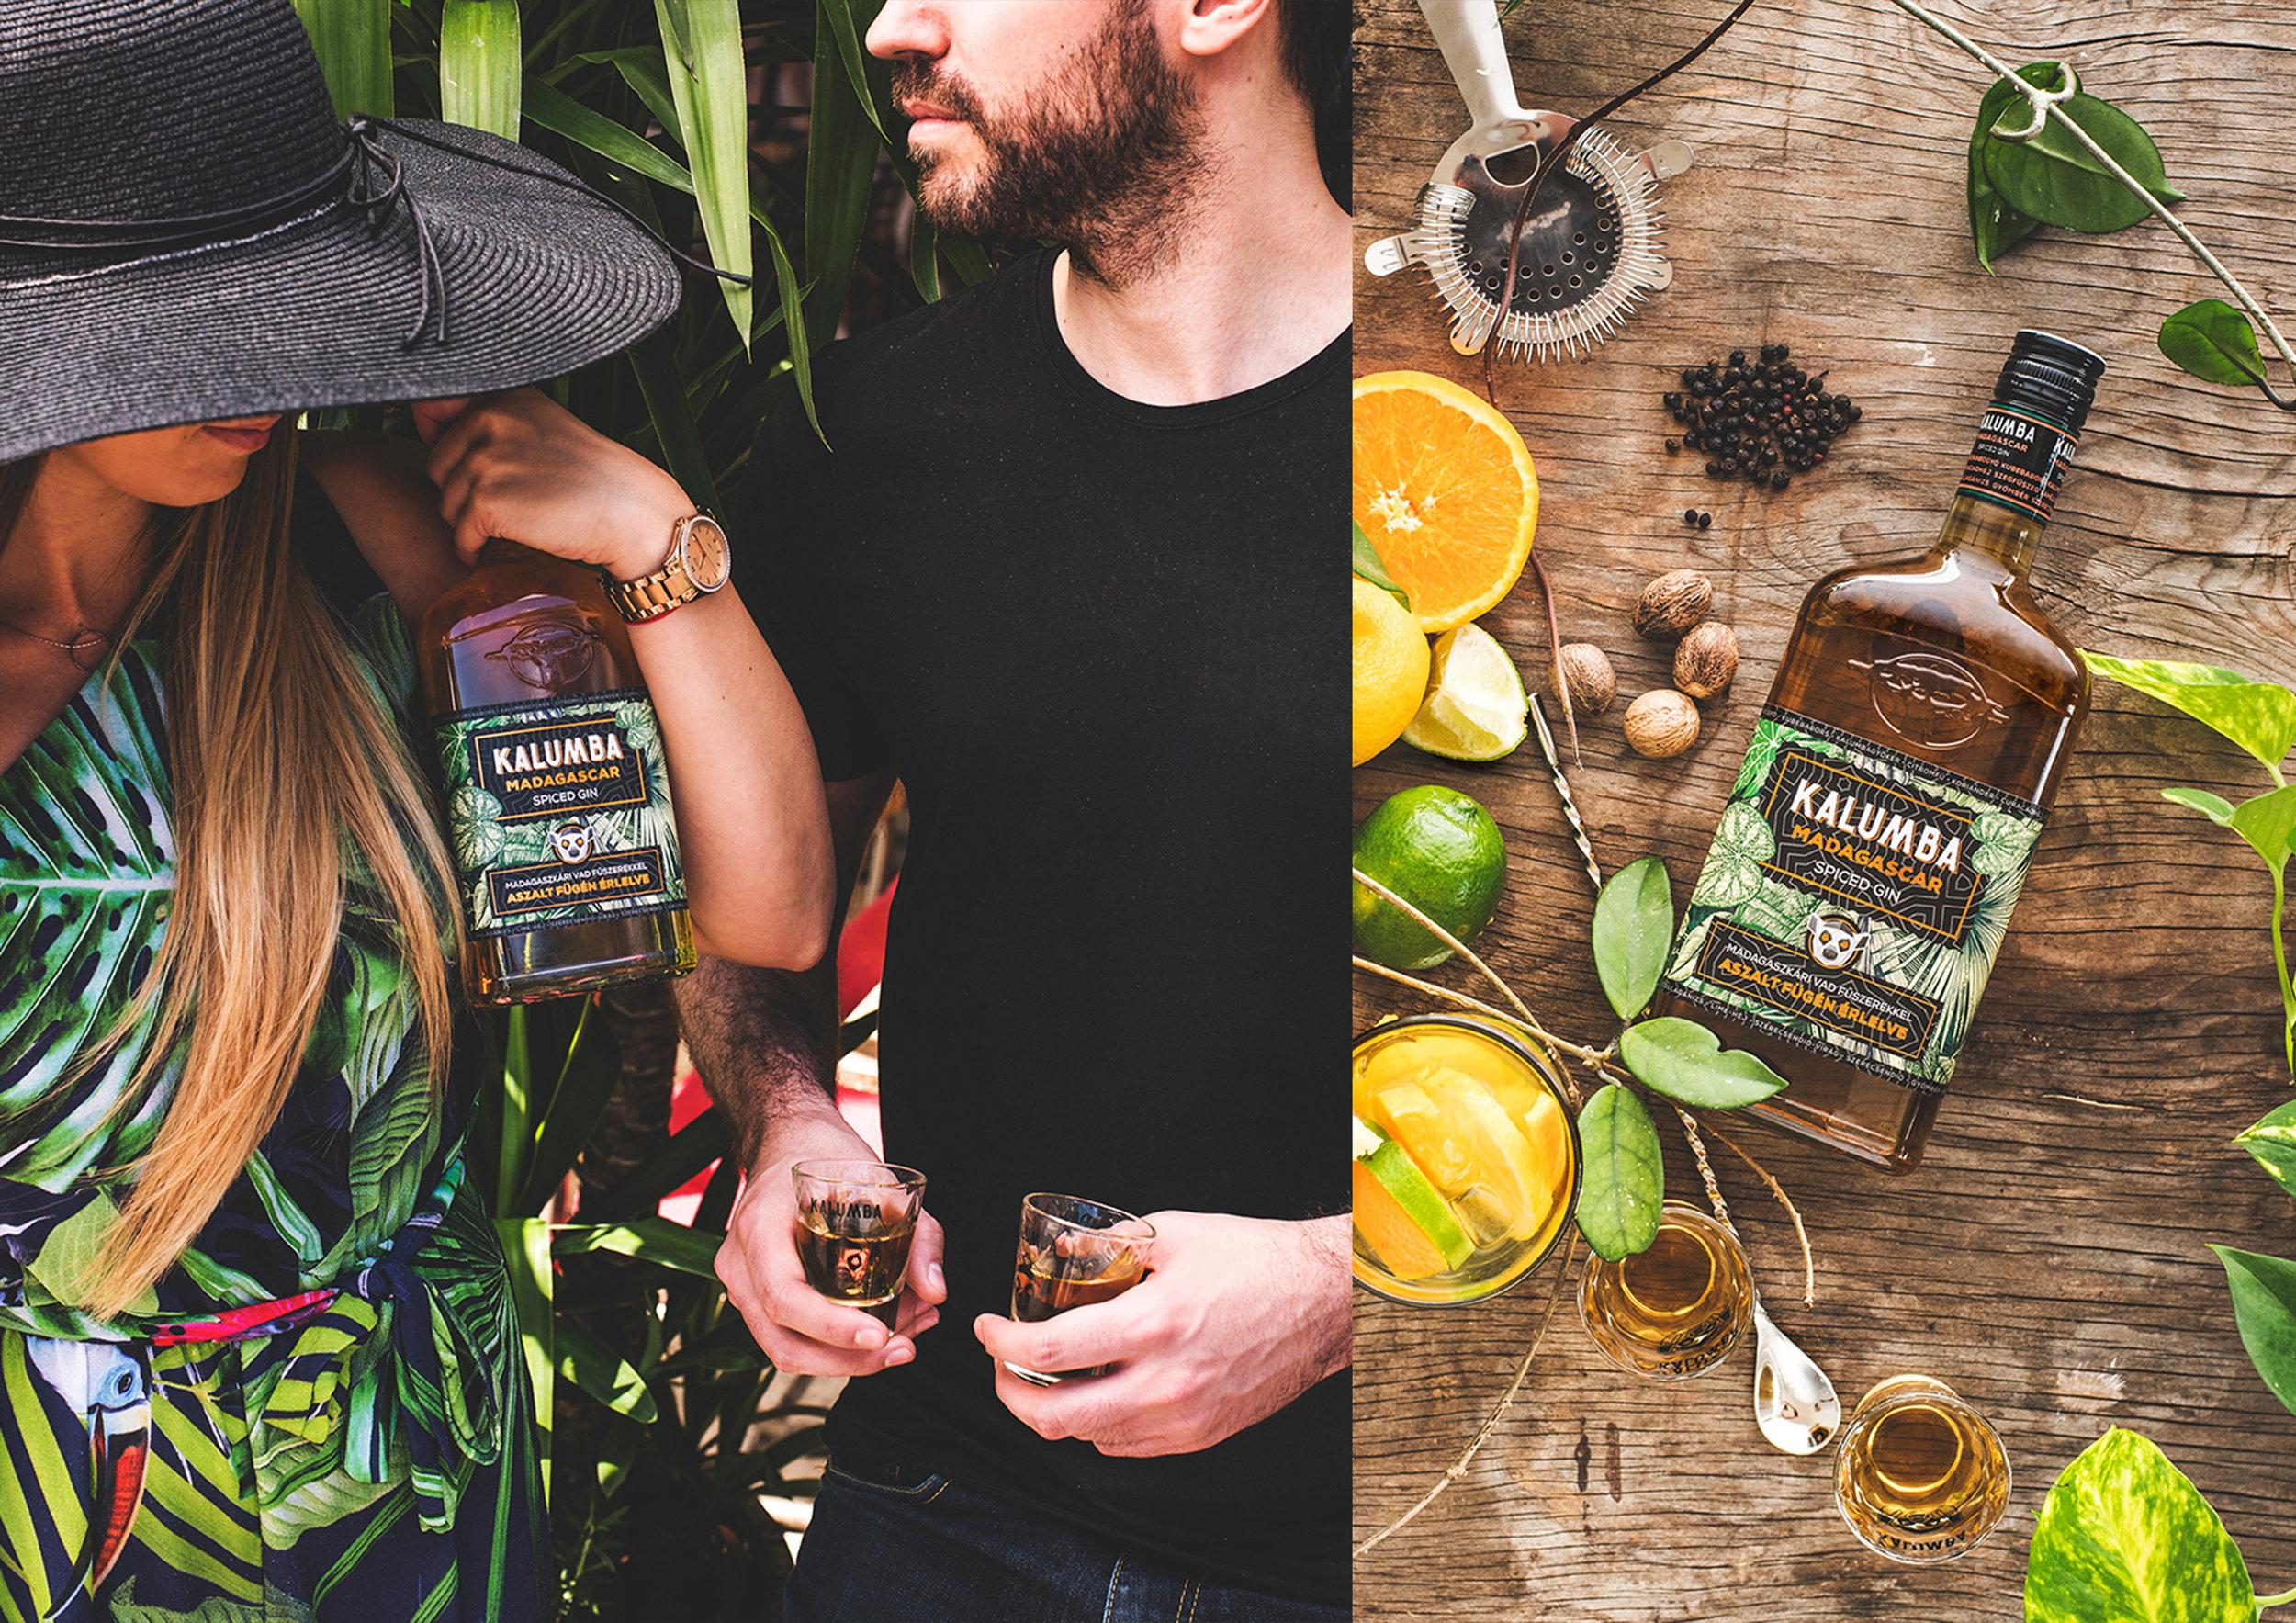 Kalumba Madagascar Spiced Gin Brand Design / World Brand and Packaging Design Society